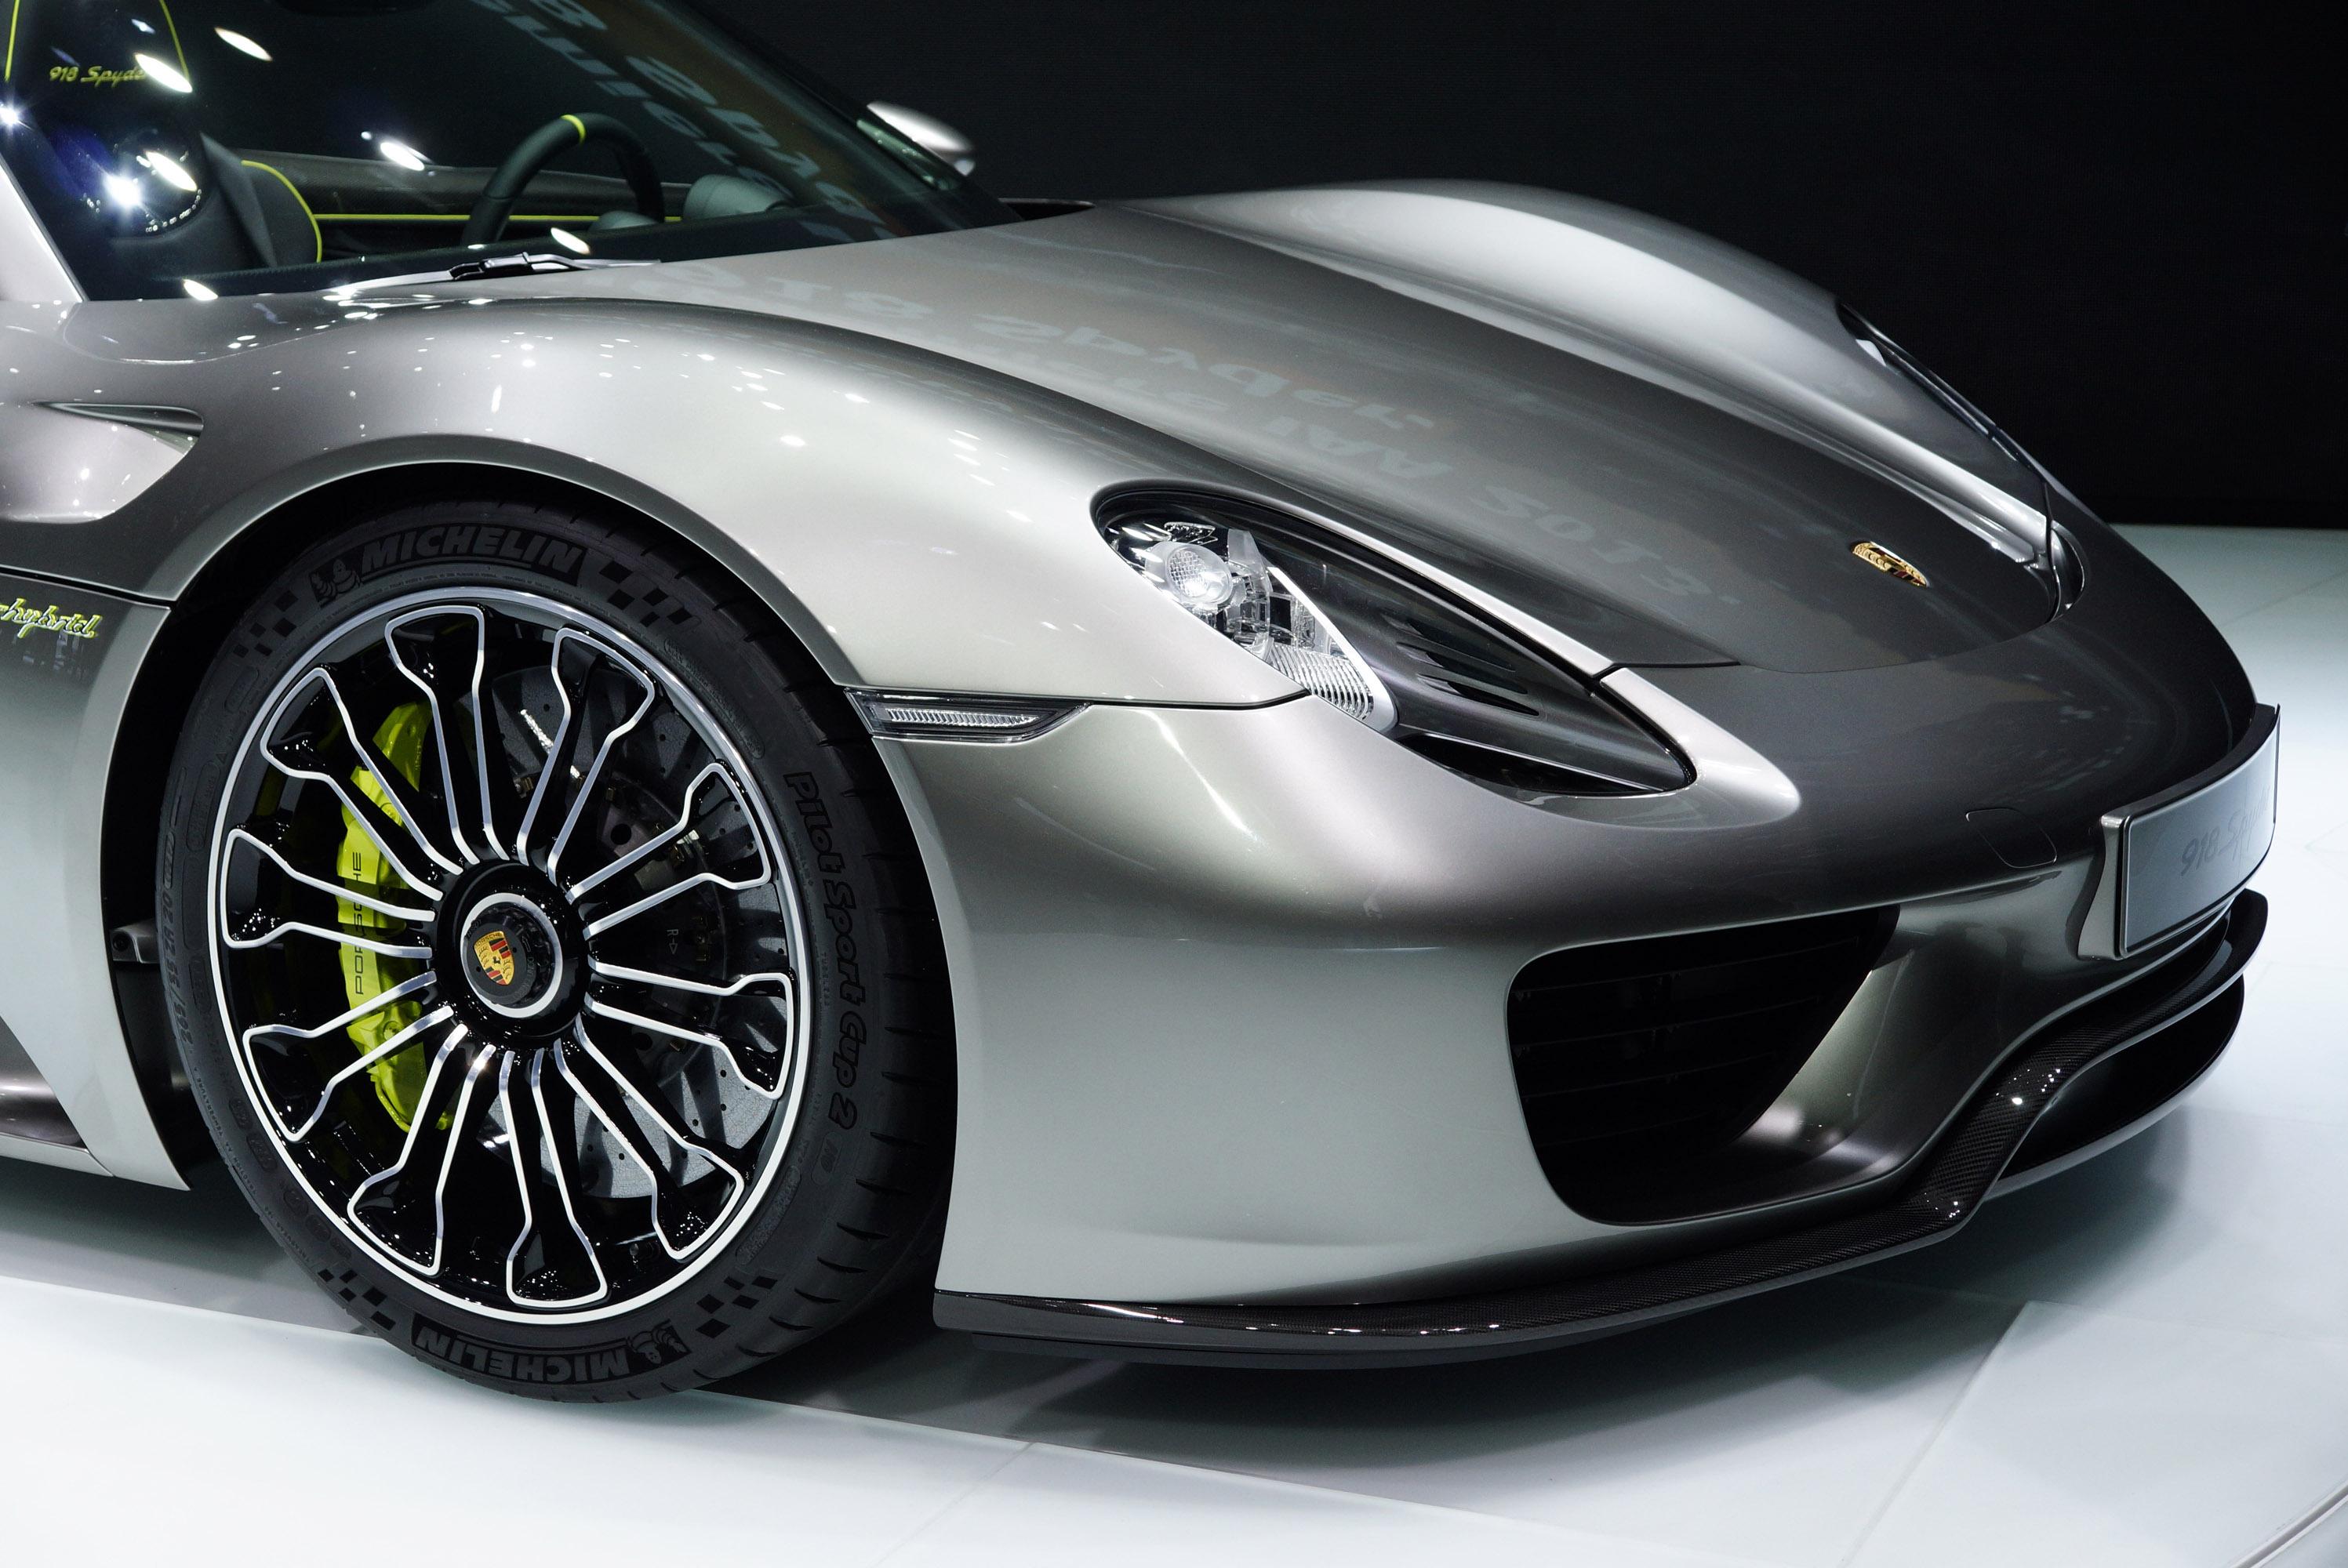 porsche-918-spyder-frankfurt-2013-06 Marvelous Porsche 918 Spyder Hybrid Prezzo Cars Trend